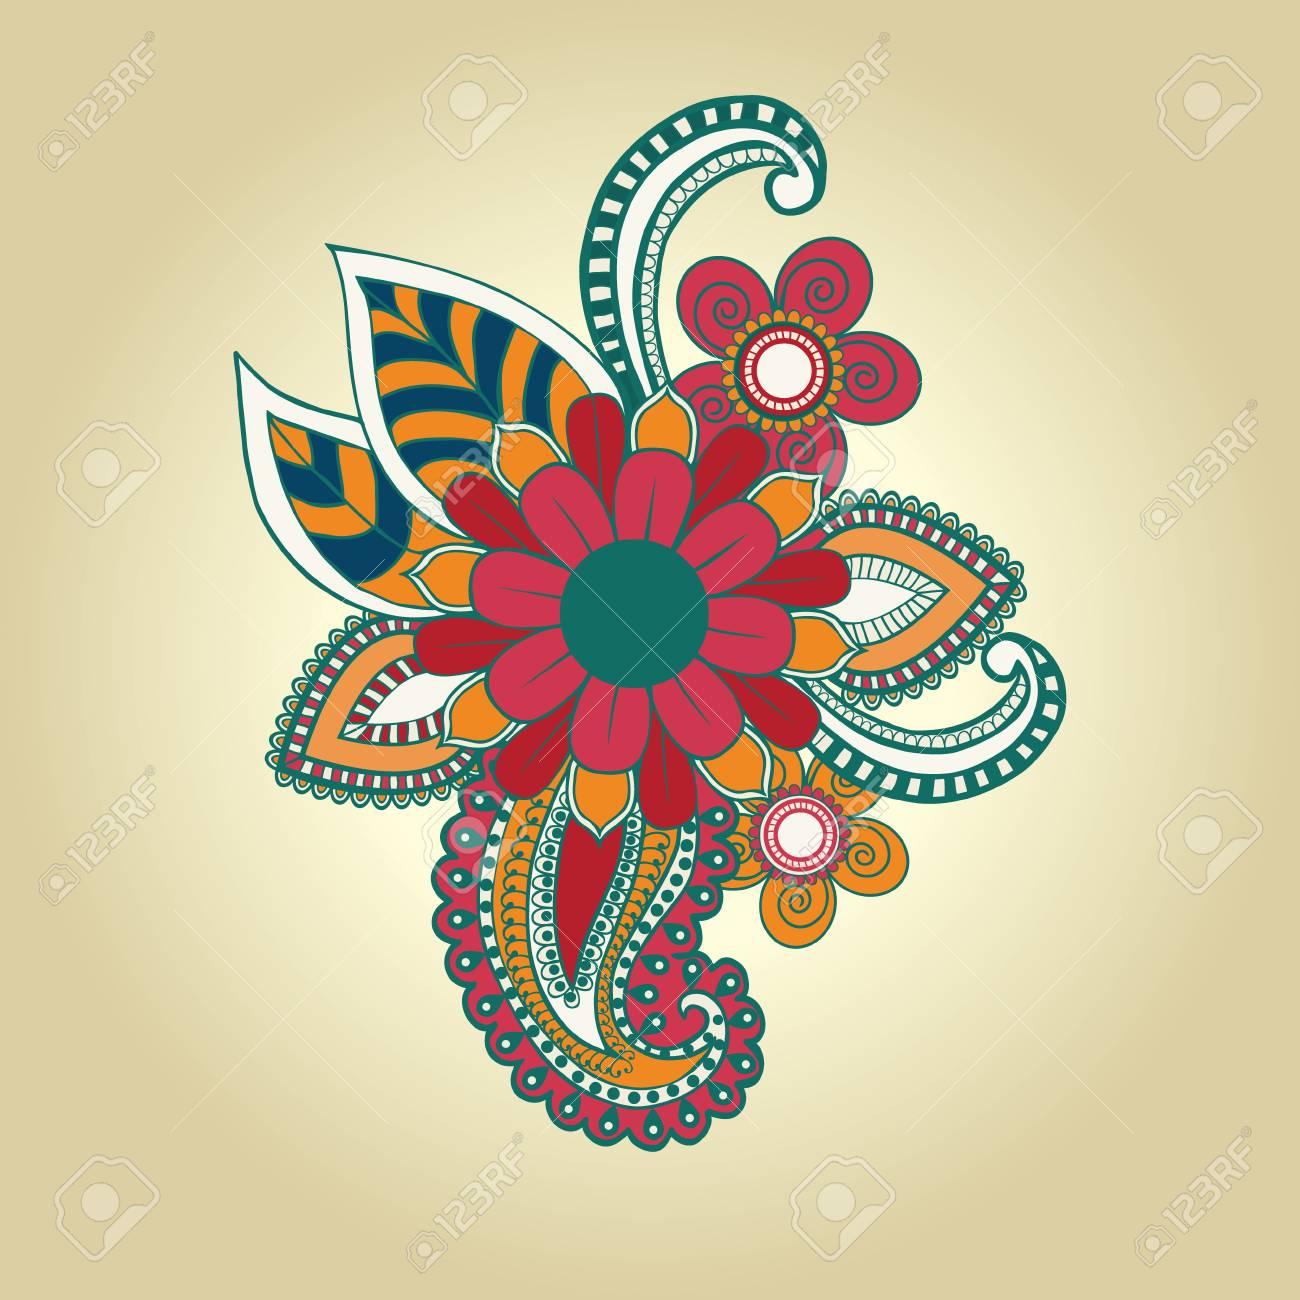 Vector Hand Draw Henna Floral Design Element Tattoo Design Ornate